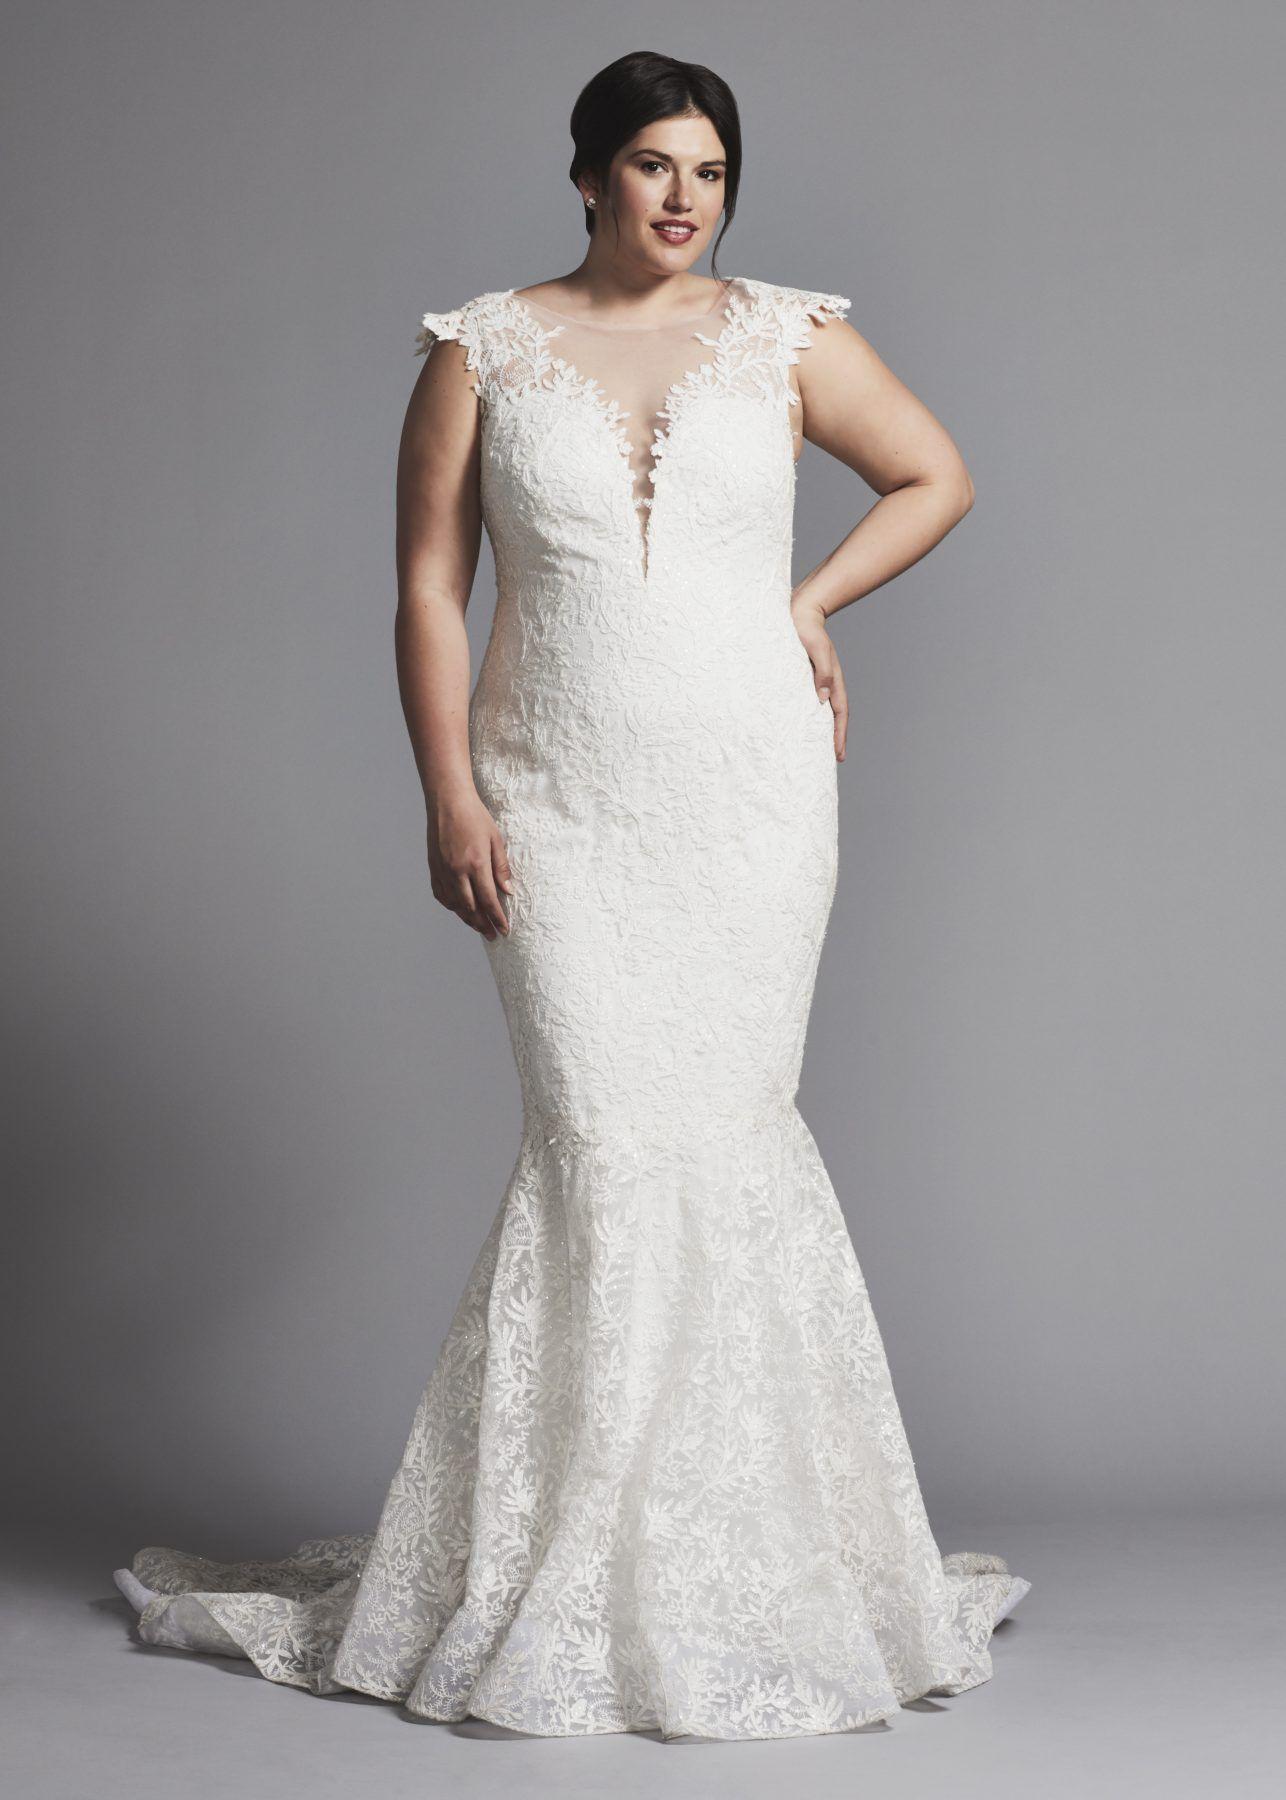 27+ White mermaid wedding dress with sleeves ideas in 2021